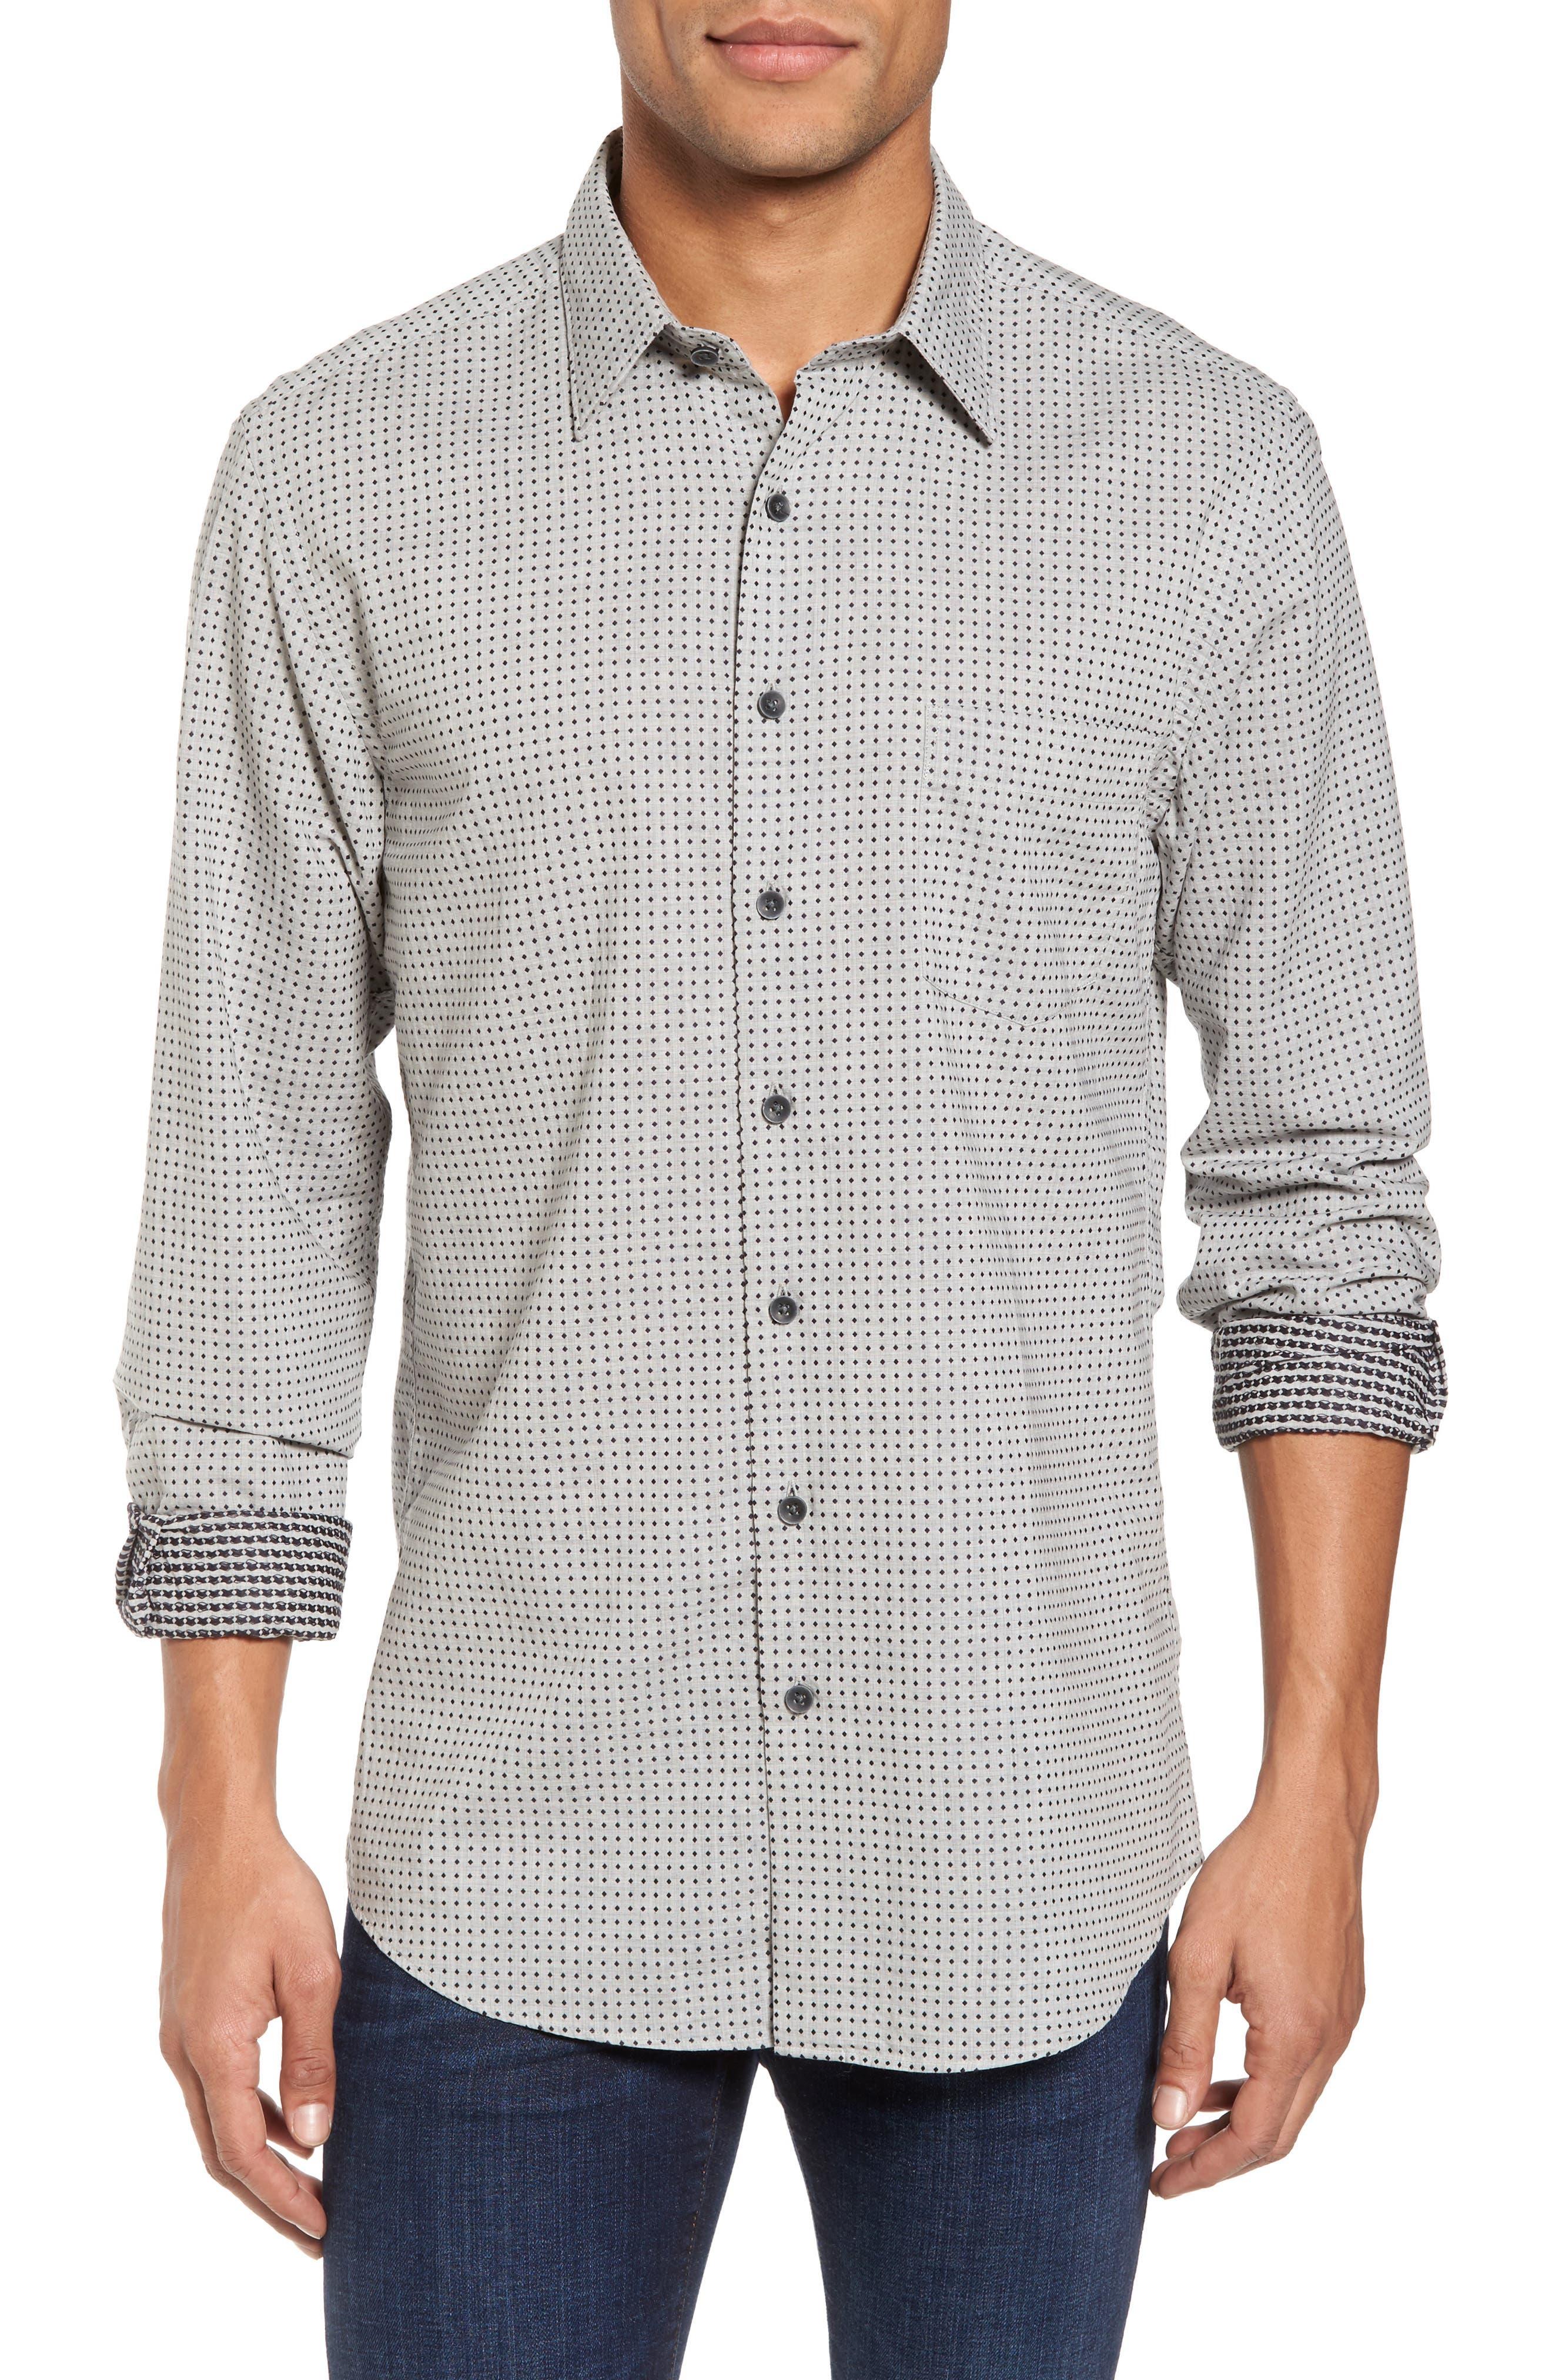 Judgeford Slim Fit Jacquard Sport Shirt,                         Main,                         color,